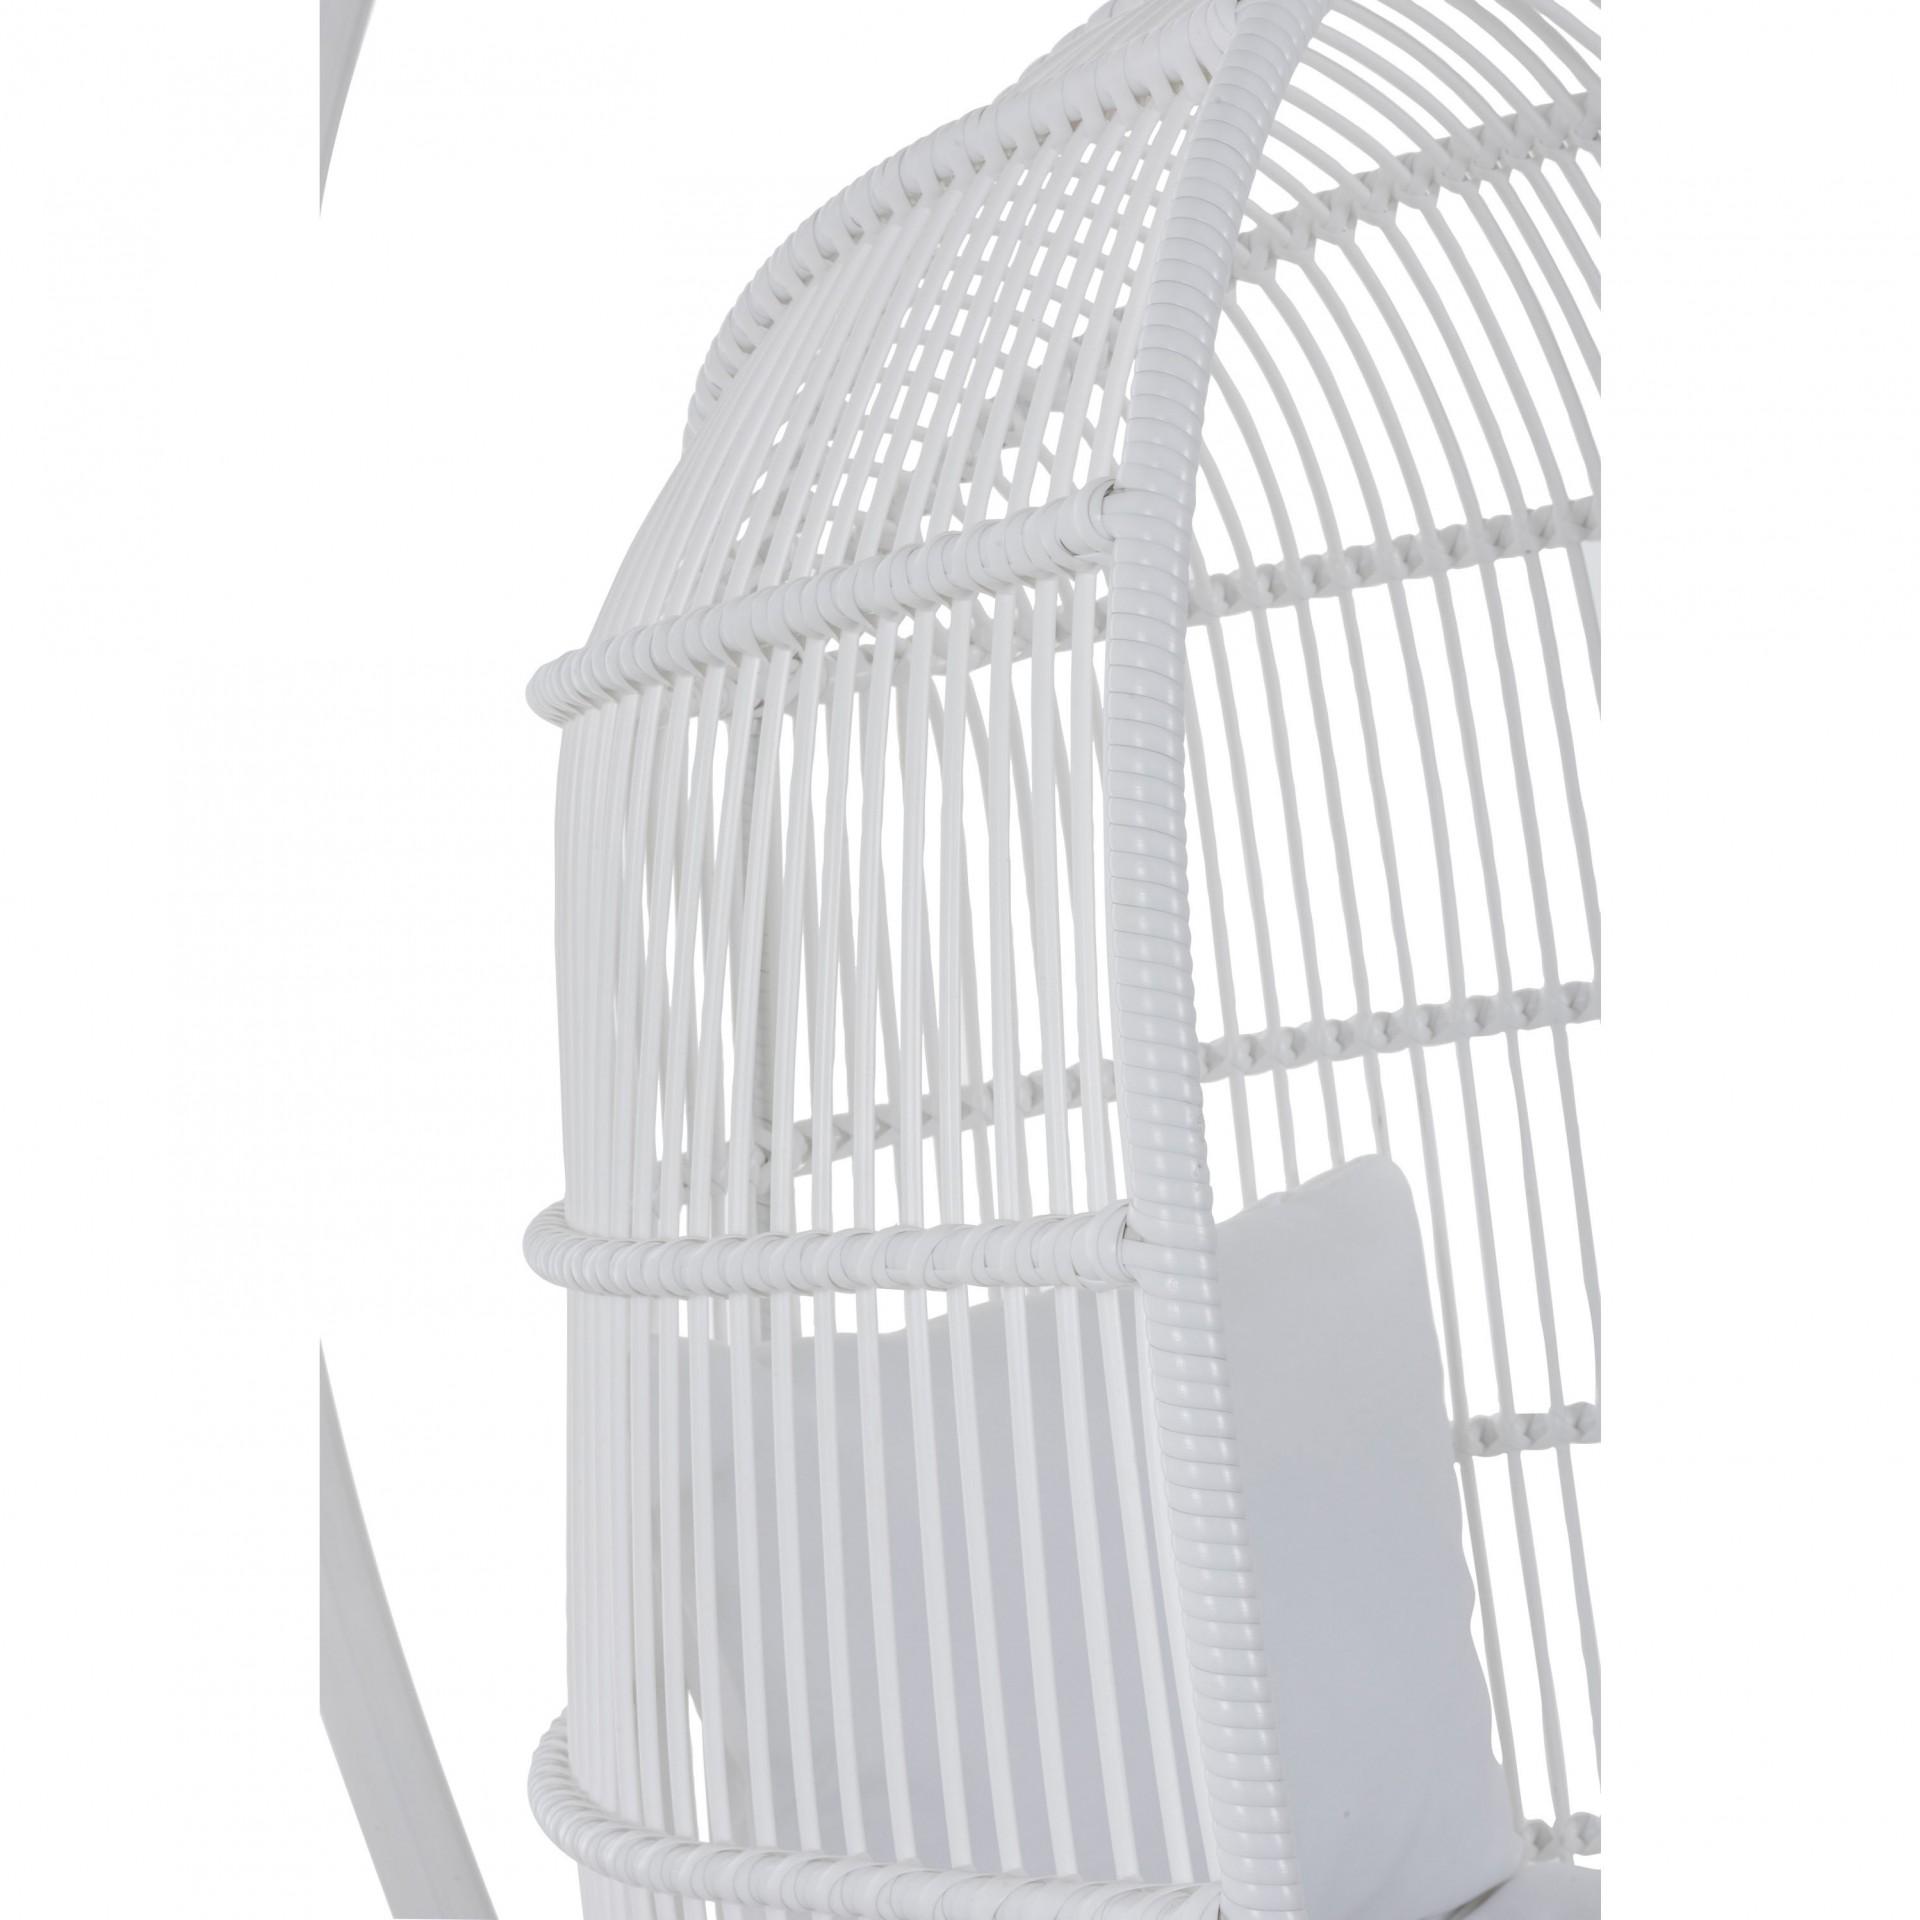 Cadeira suspensa c/base, metal/vime, branco, 119x105x193